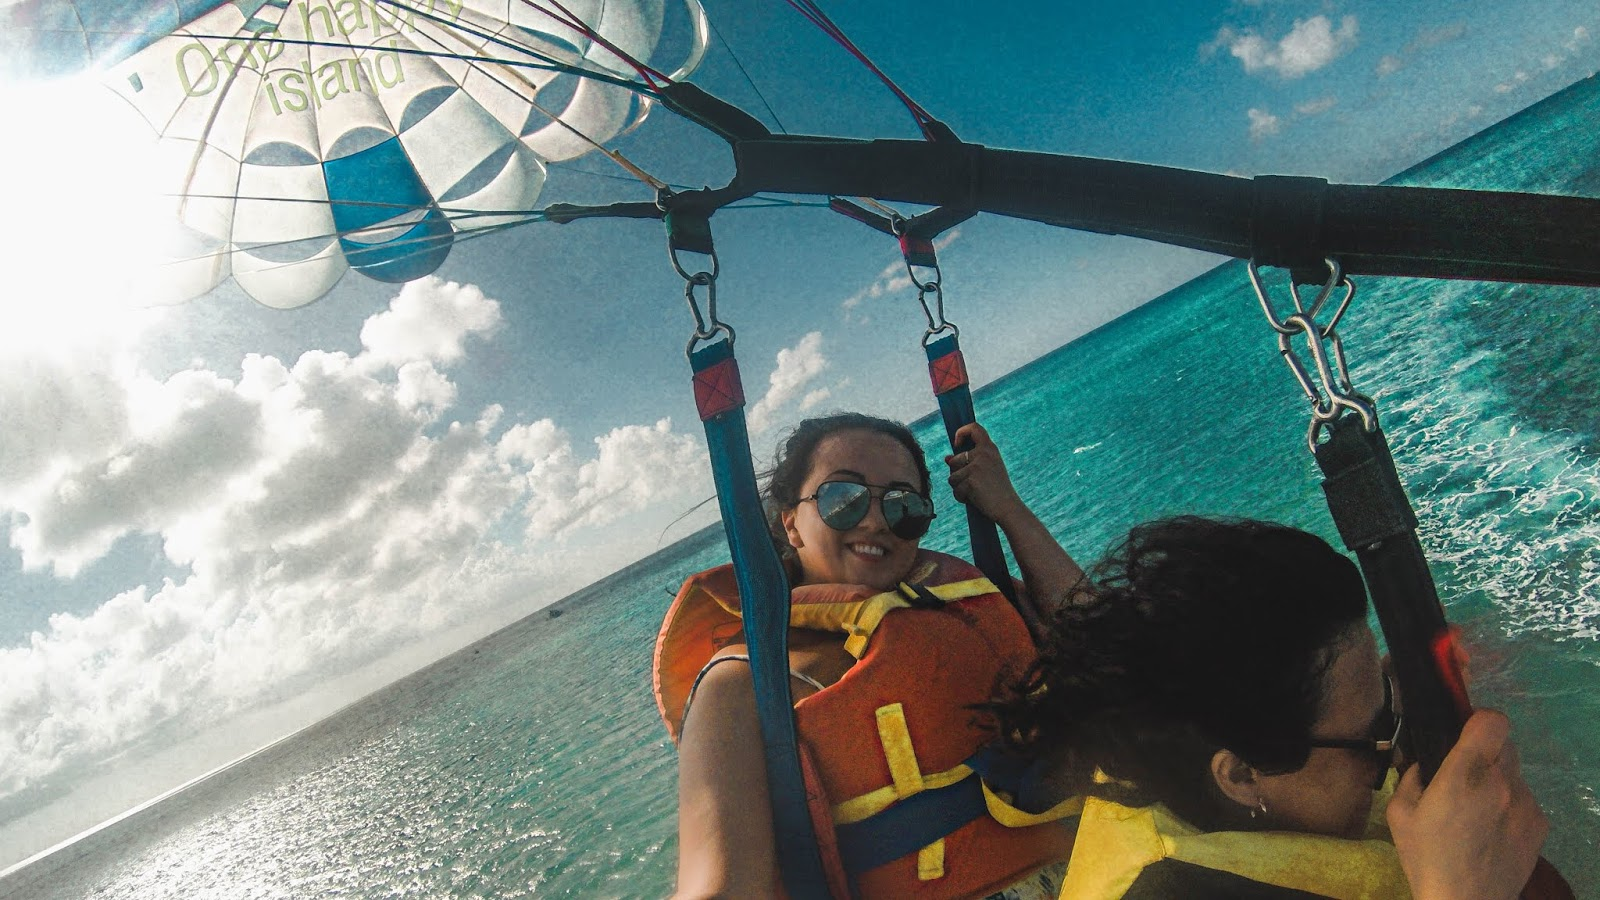 Parasailing in Aruba